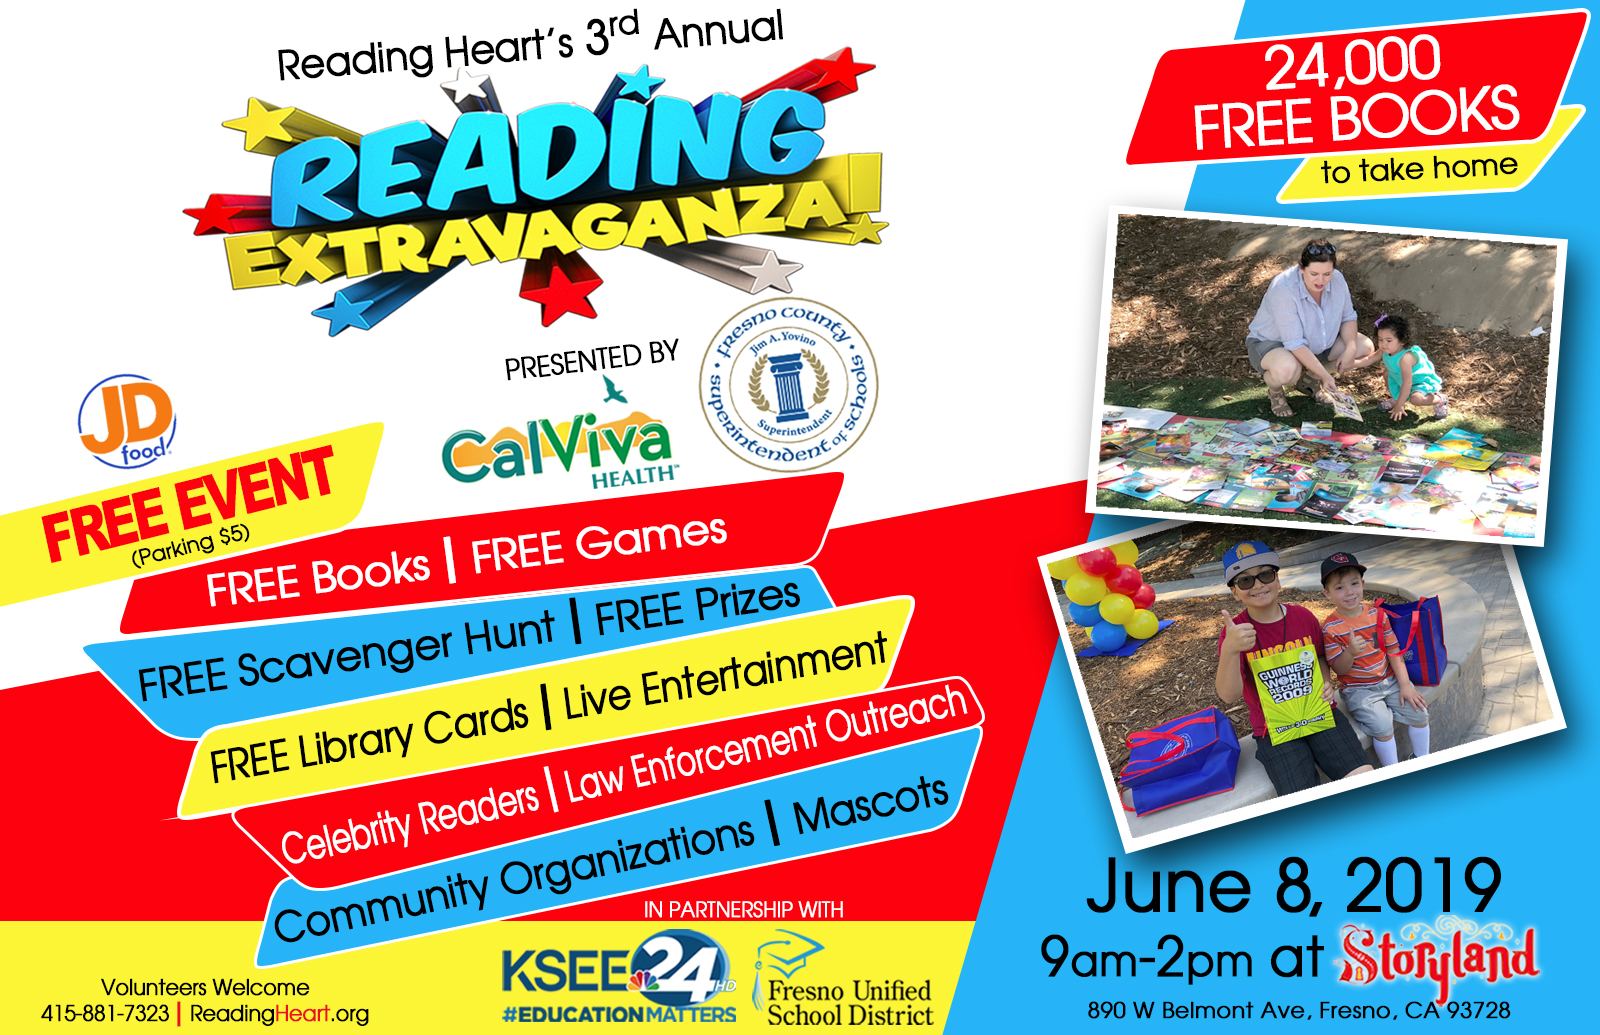 Reading Heart - A Book Donation Program